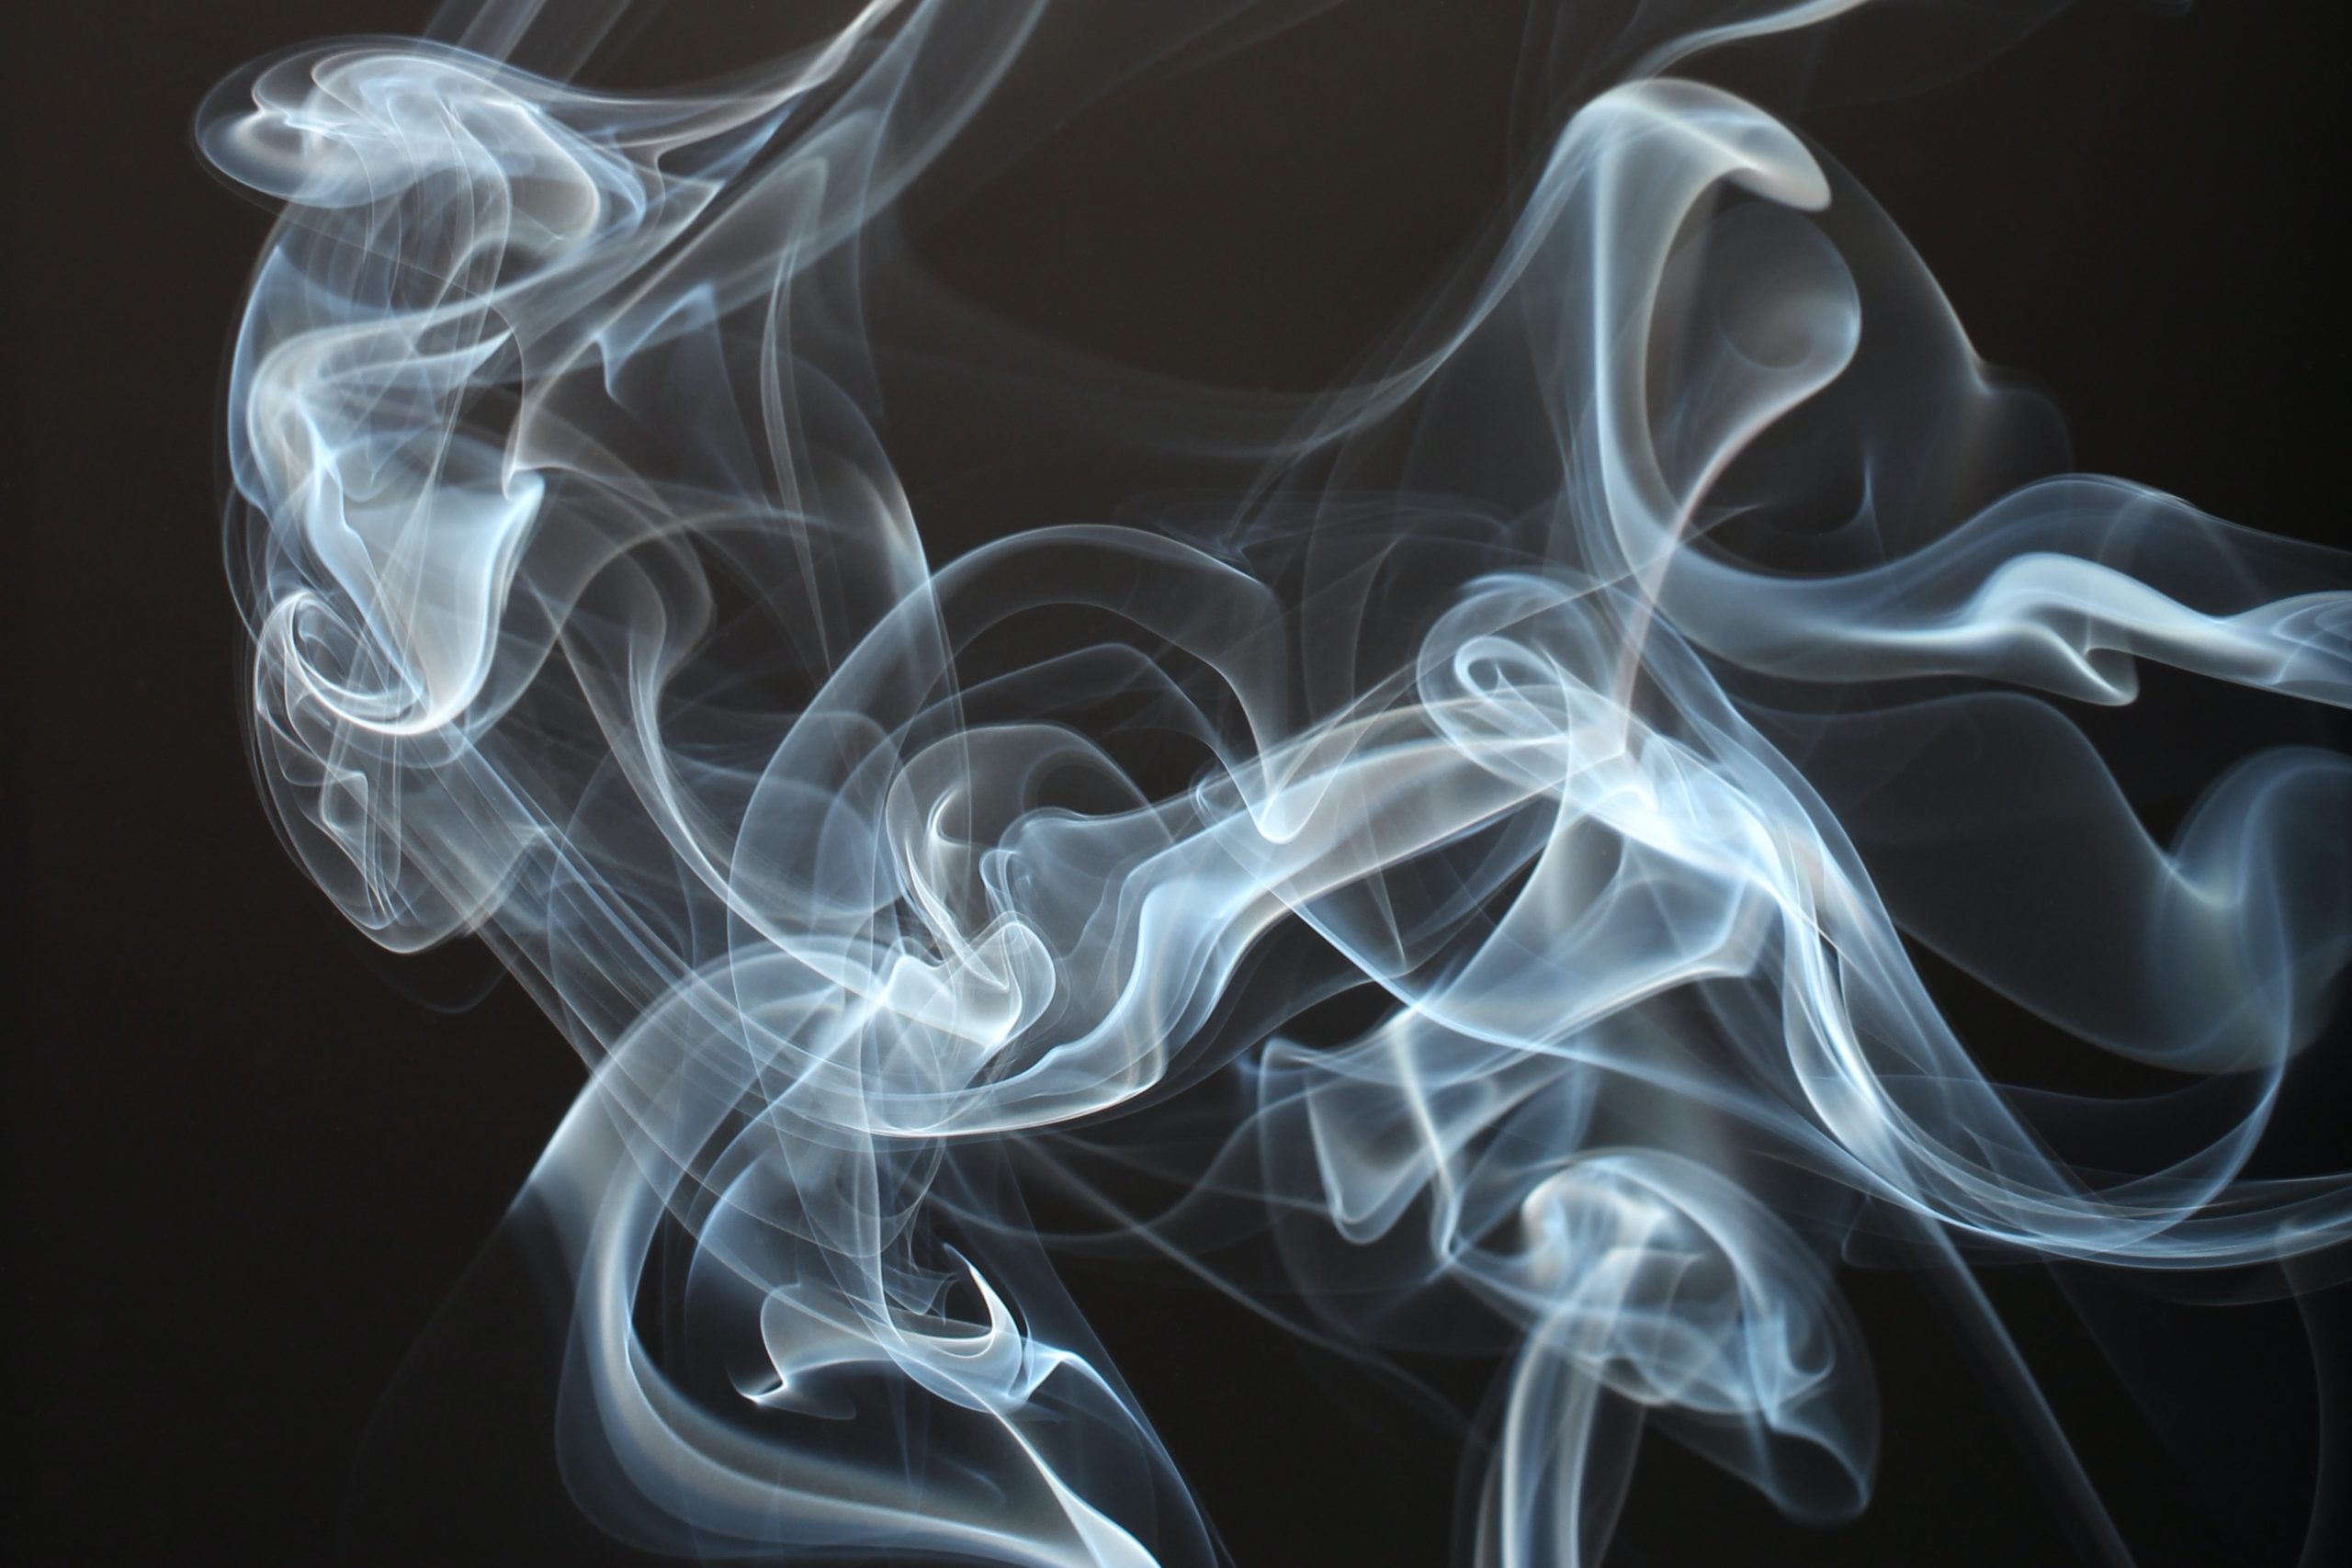 A nuvem de fumaça do vape deixa cheiro